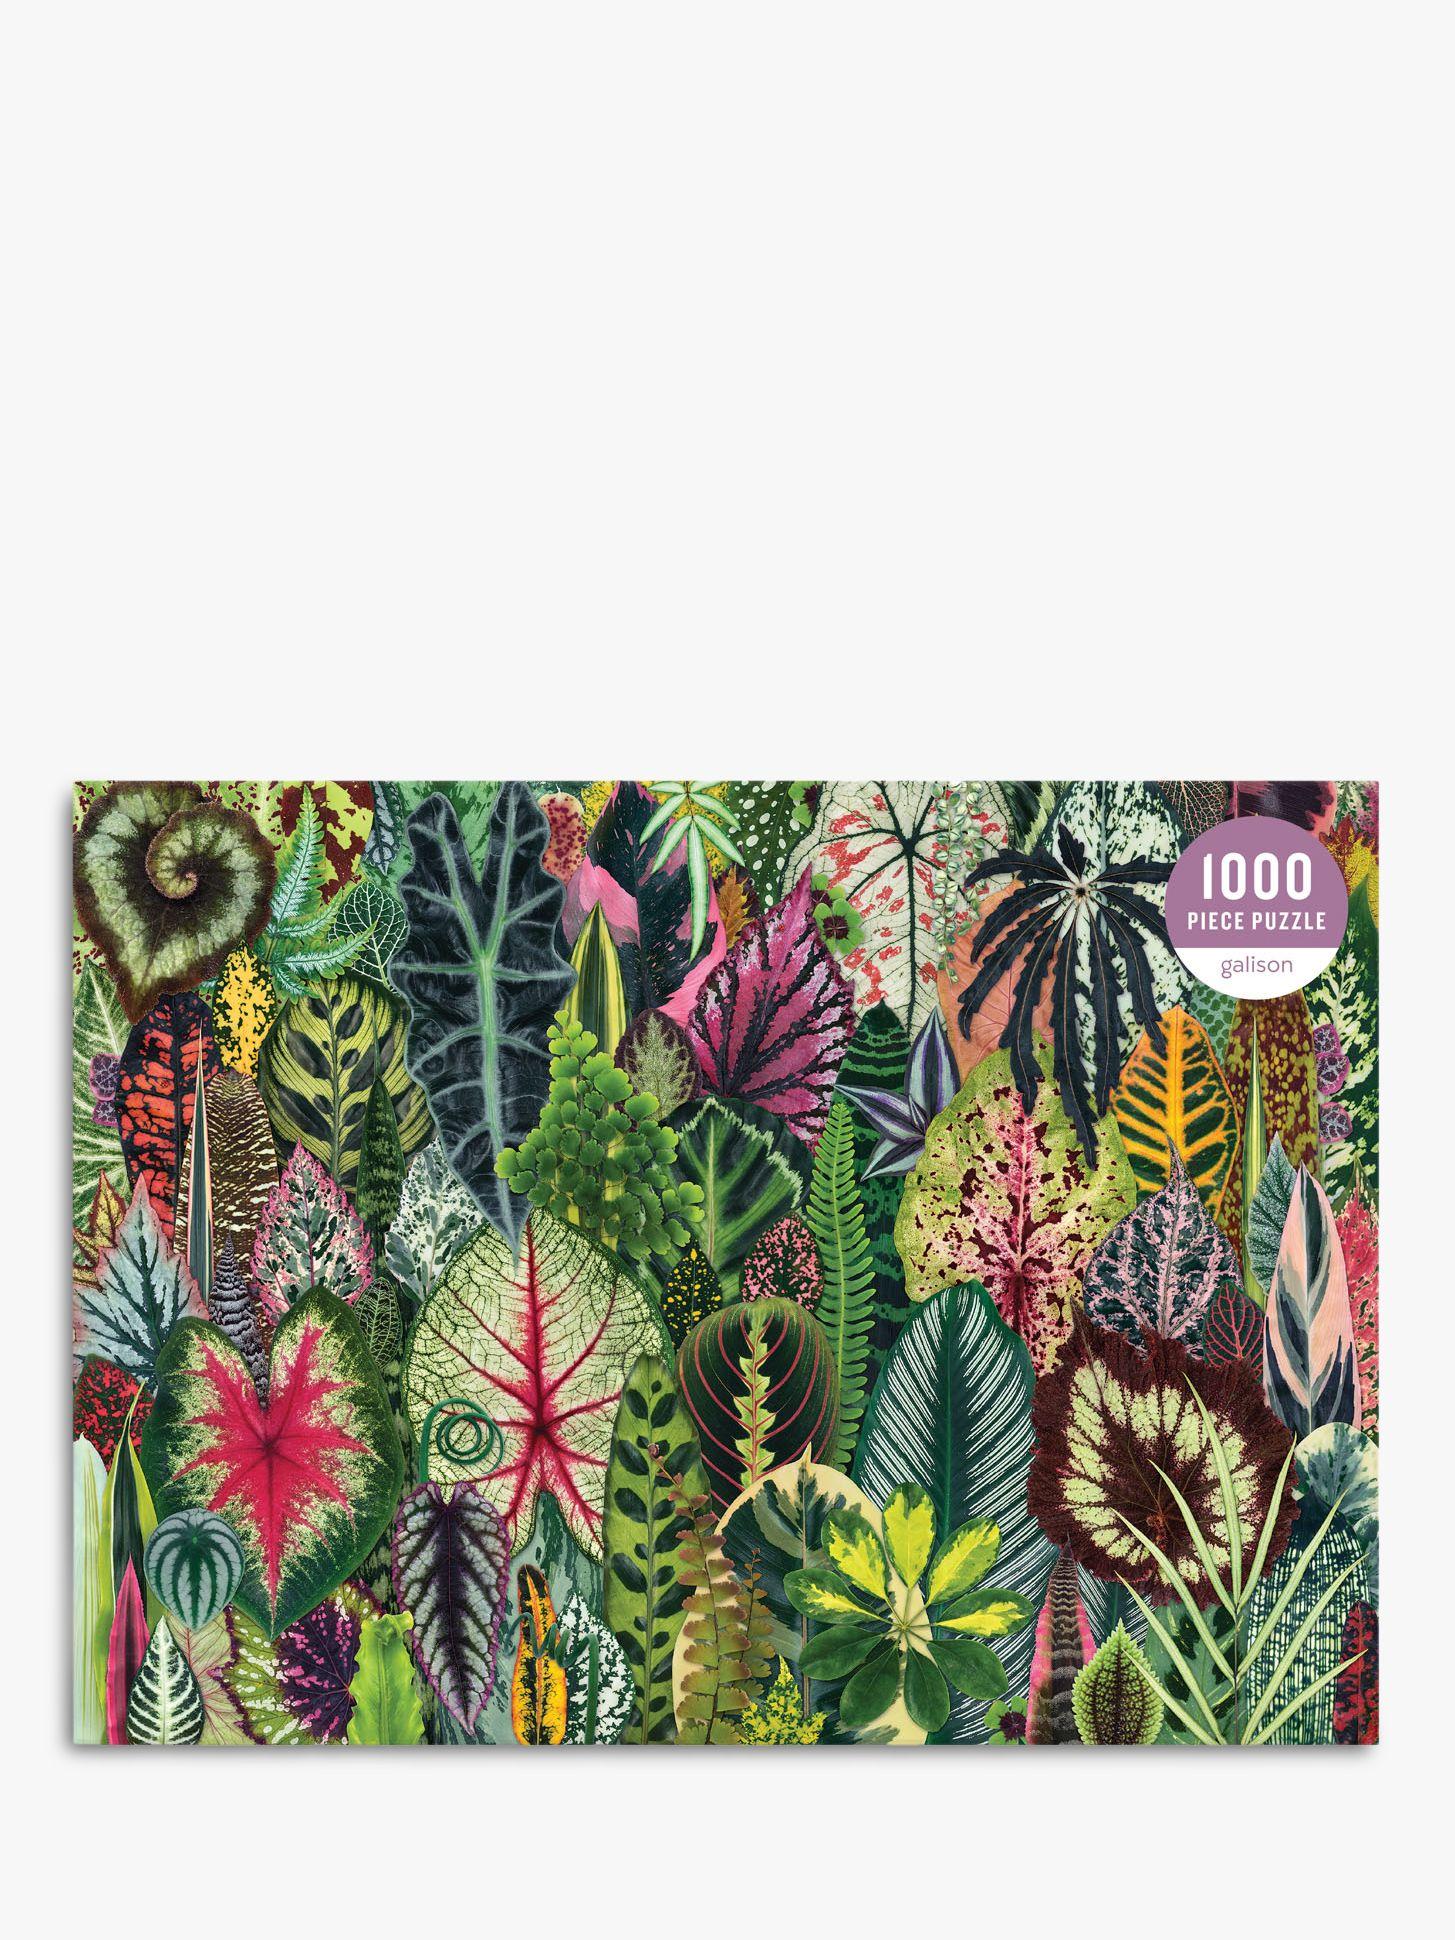 Galison Galison Houseplant Jungle Jigsaw Puzzle, 1000 Pieces